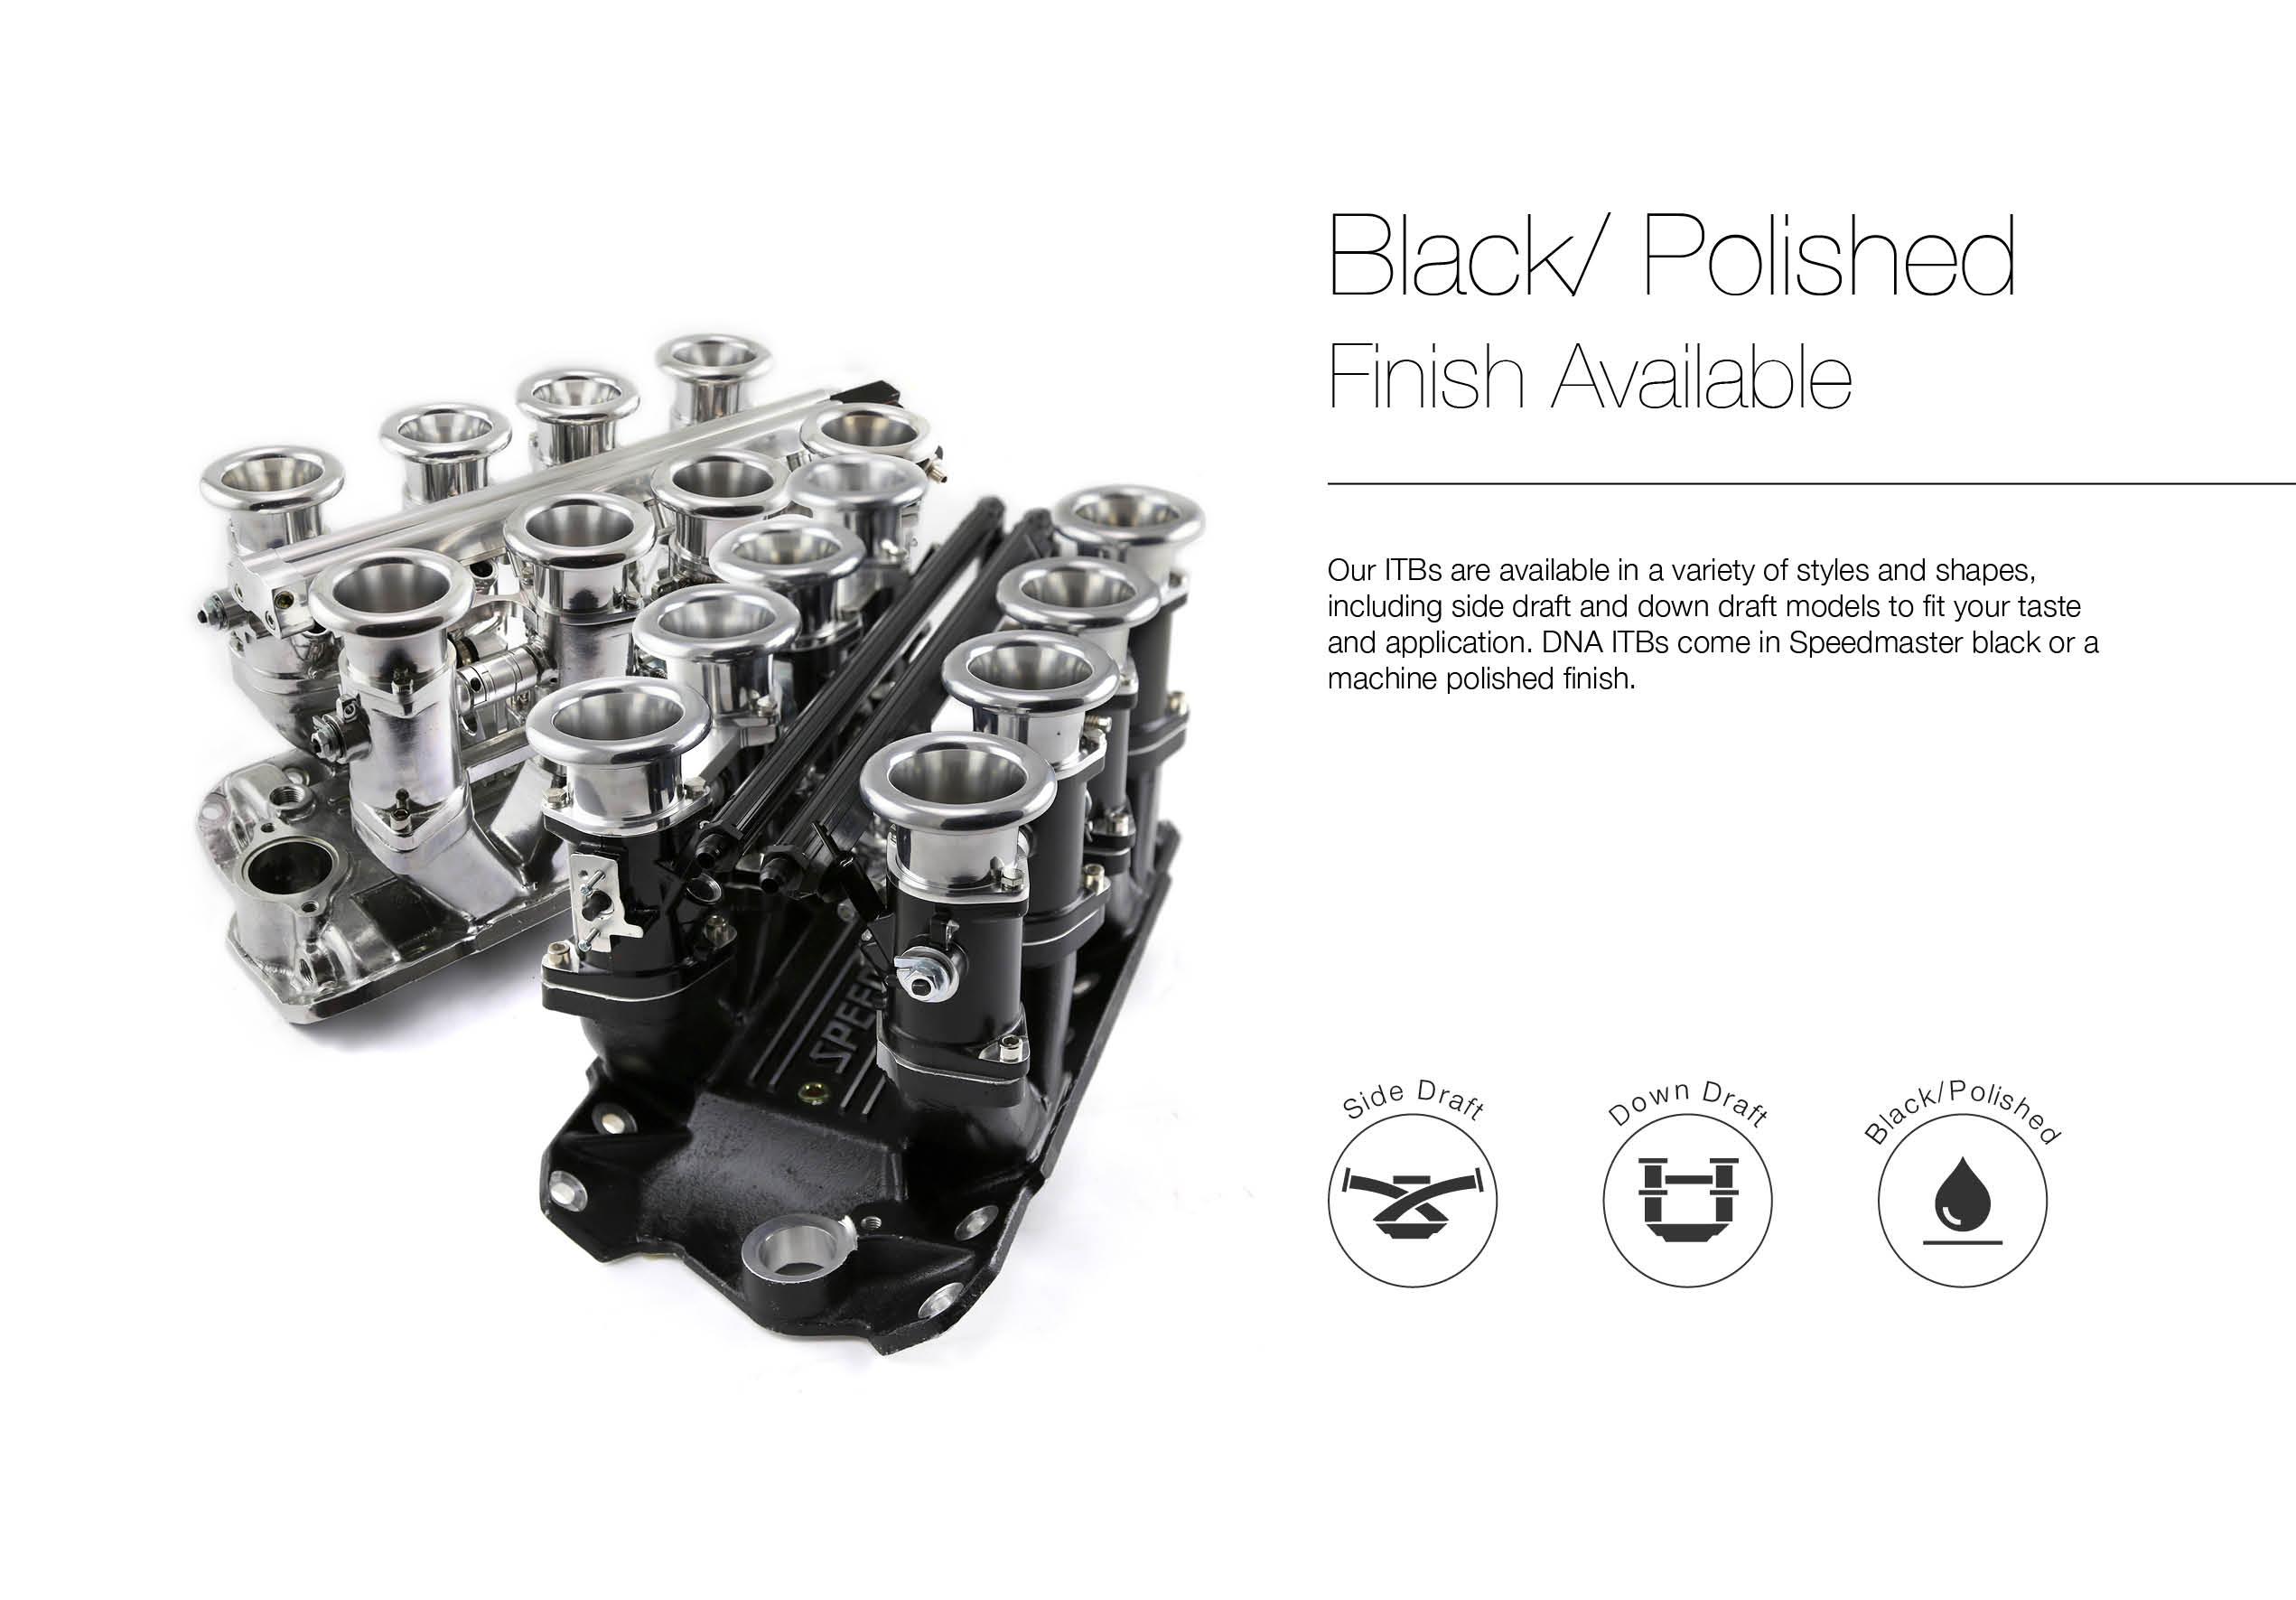 Ford 351w Windsor Sidedraft 8 Stack Efi Intake Manifold